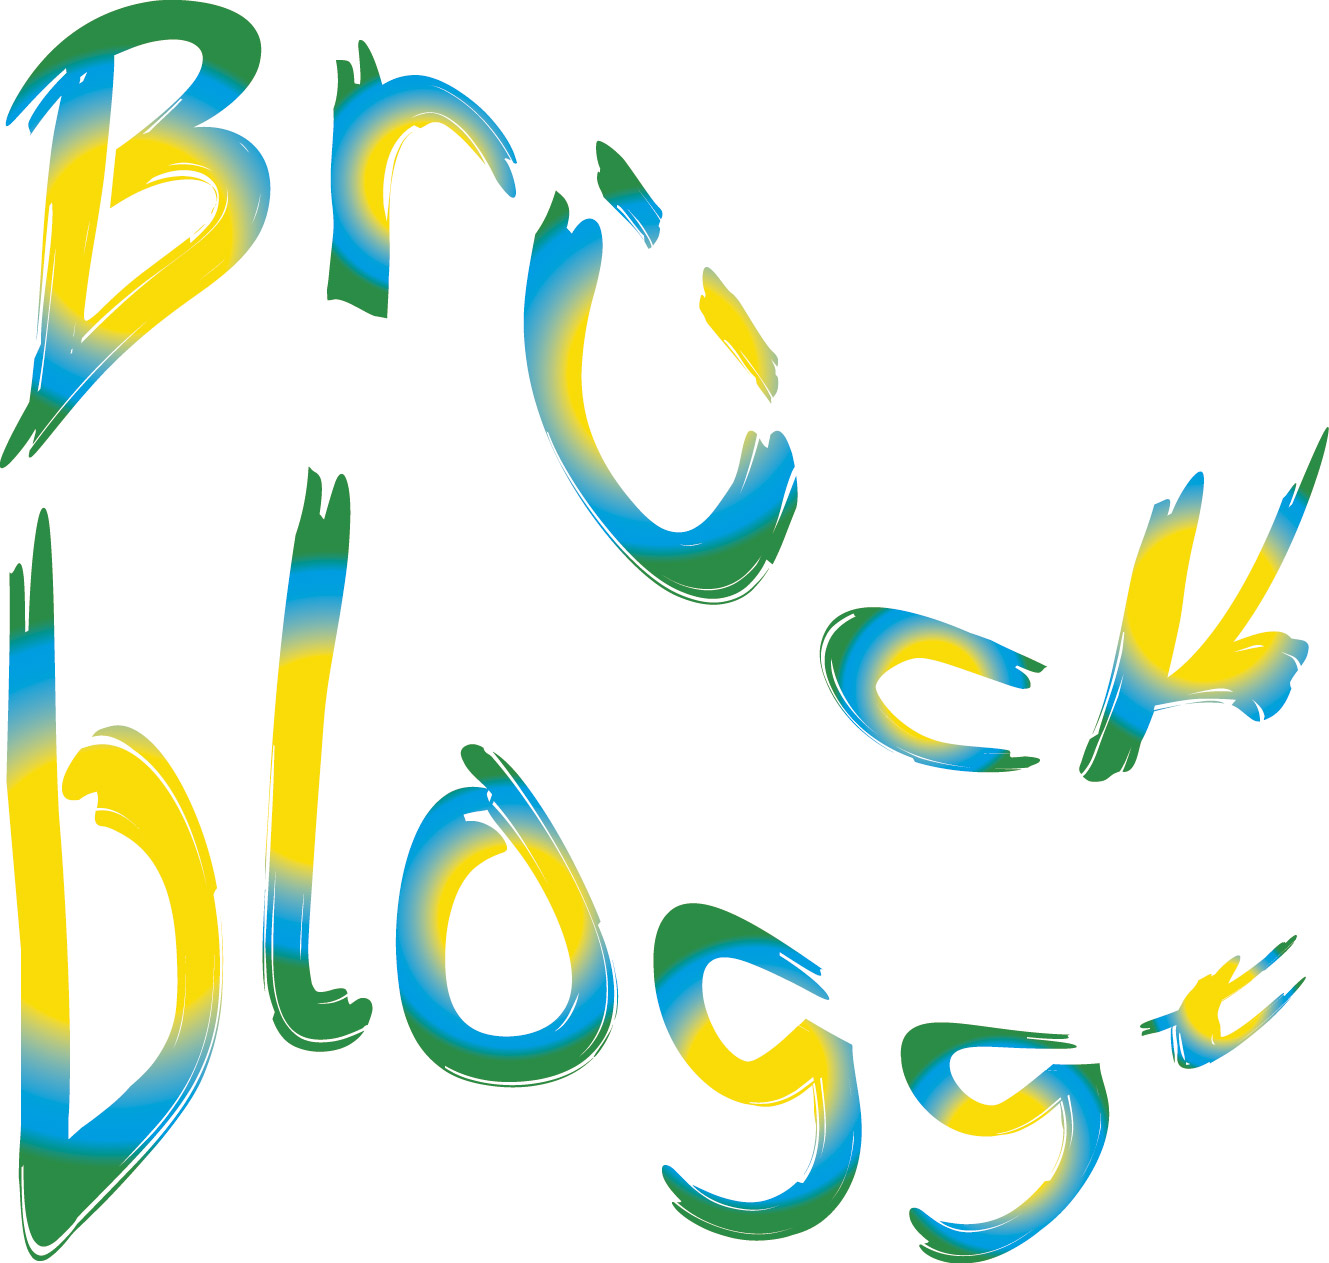 Brueck bloggt Logo